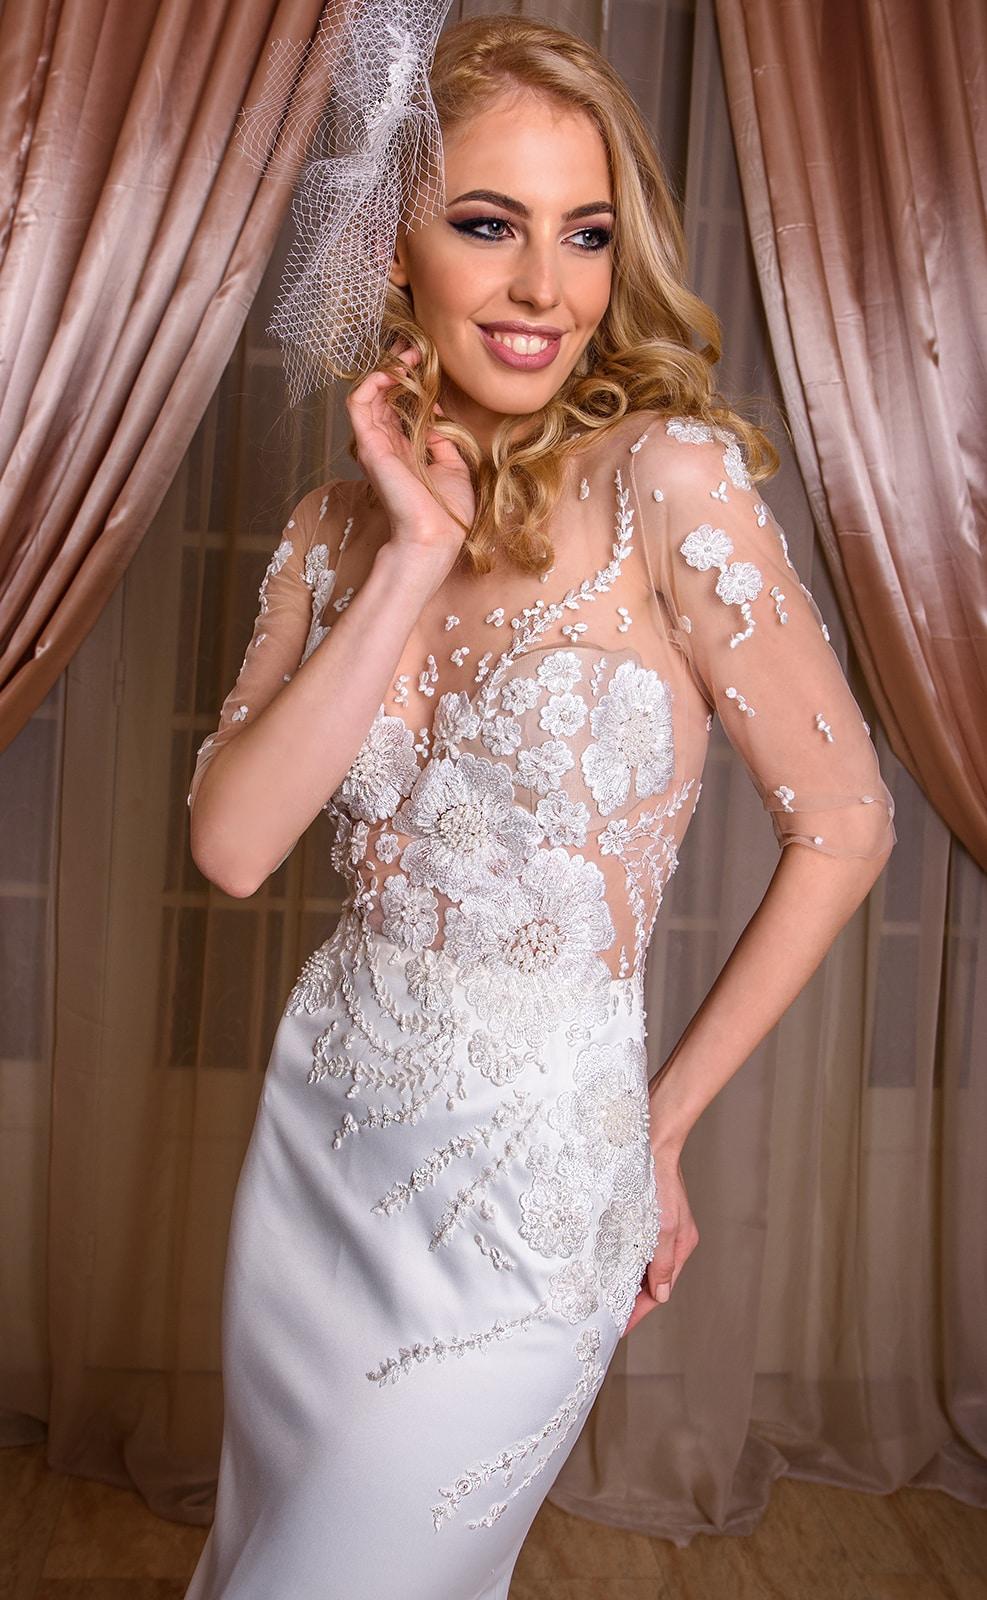 Nelda Model - Colectia Baroque - Adora Sposa (3)